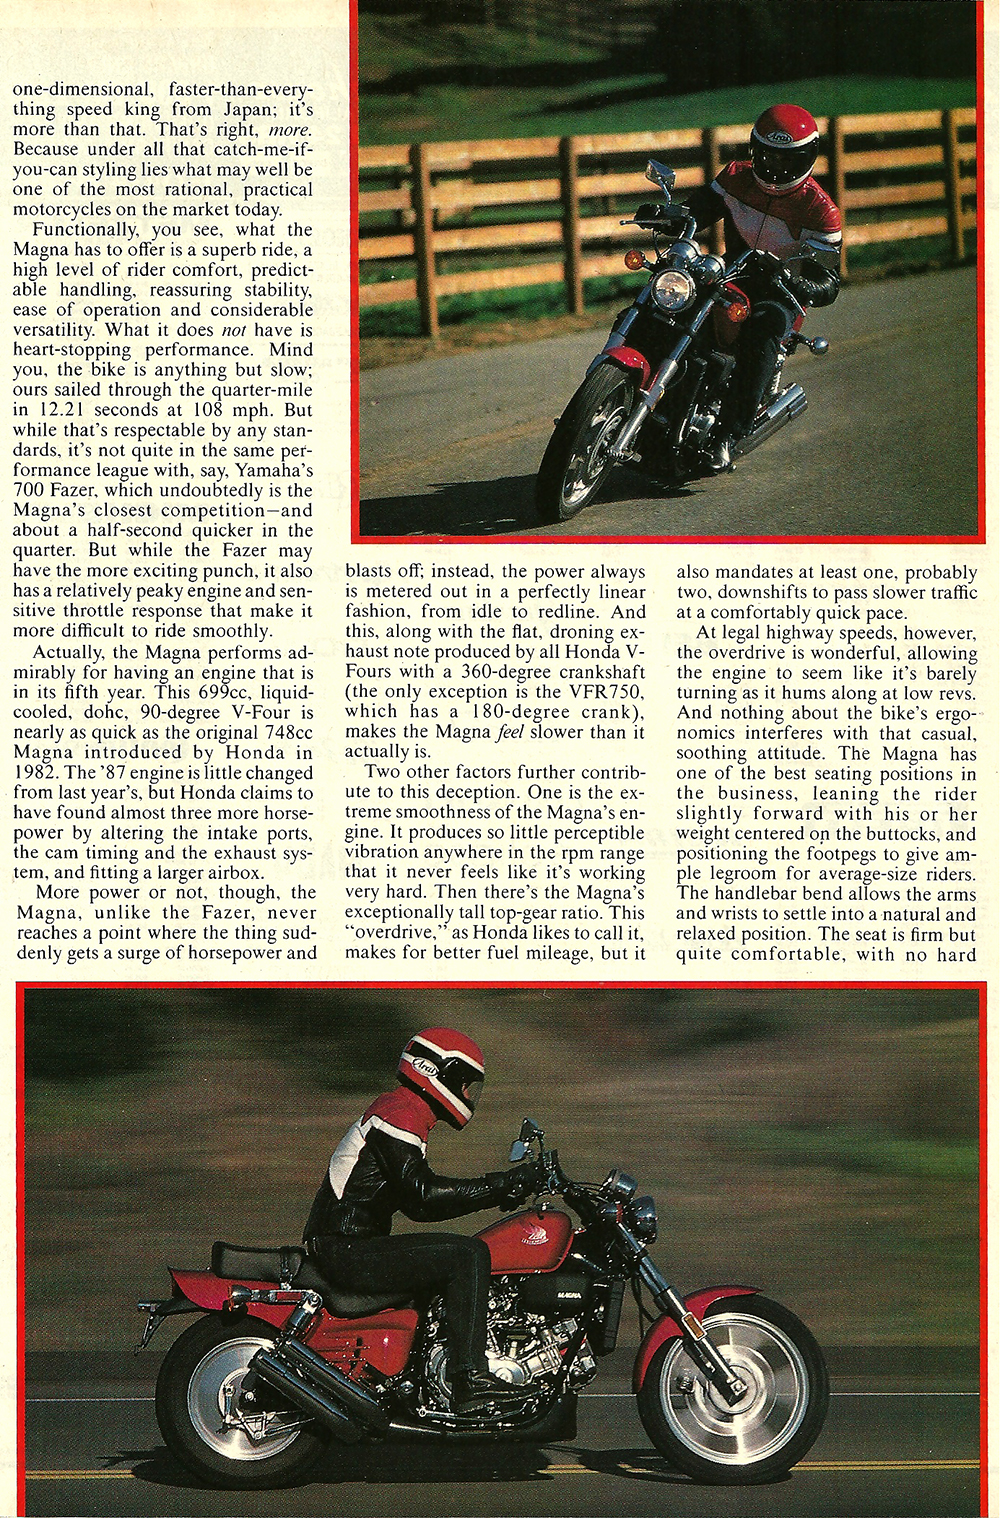 1987 Honda 700 Magna road test 03.jpg